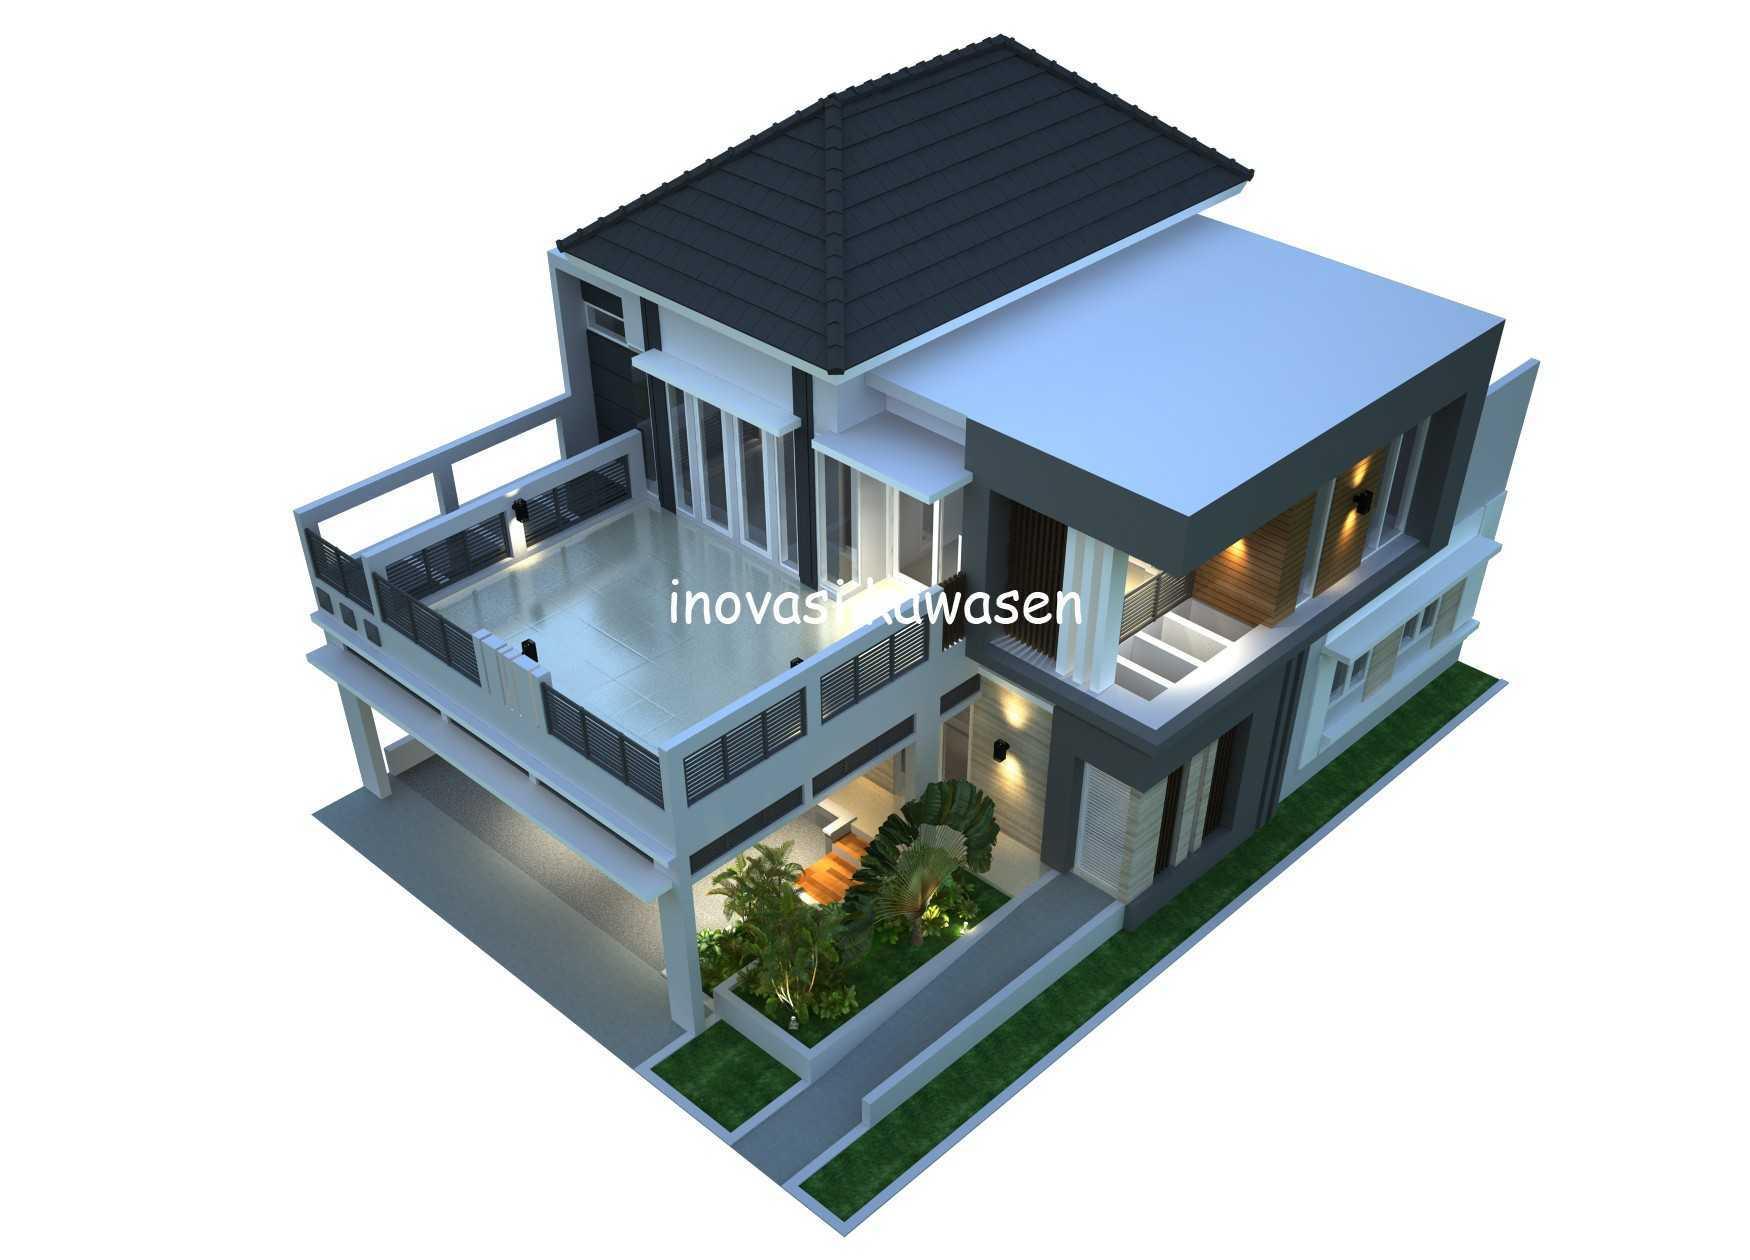 Inovasi Kawasen Re-Design Fasad Kota Depok, Jawa Barat, Indonesia Kota Depok, Jawa Barat, Indonesia Inovasi-Kawasen-Re-Design-Fasad   89894